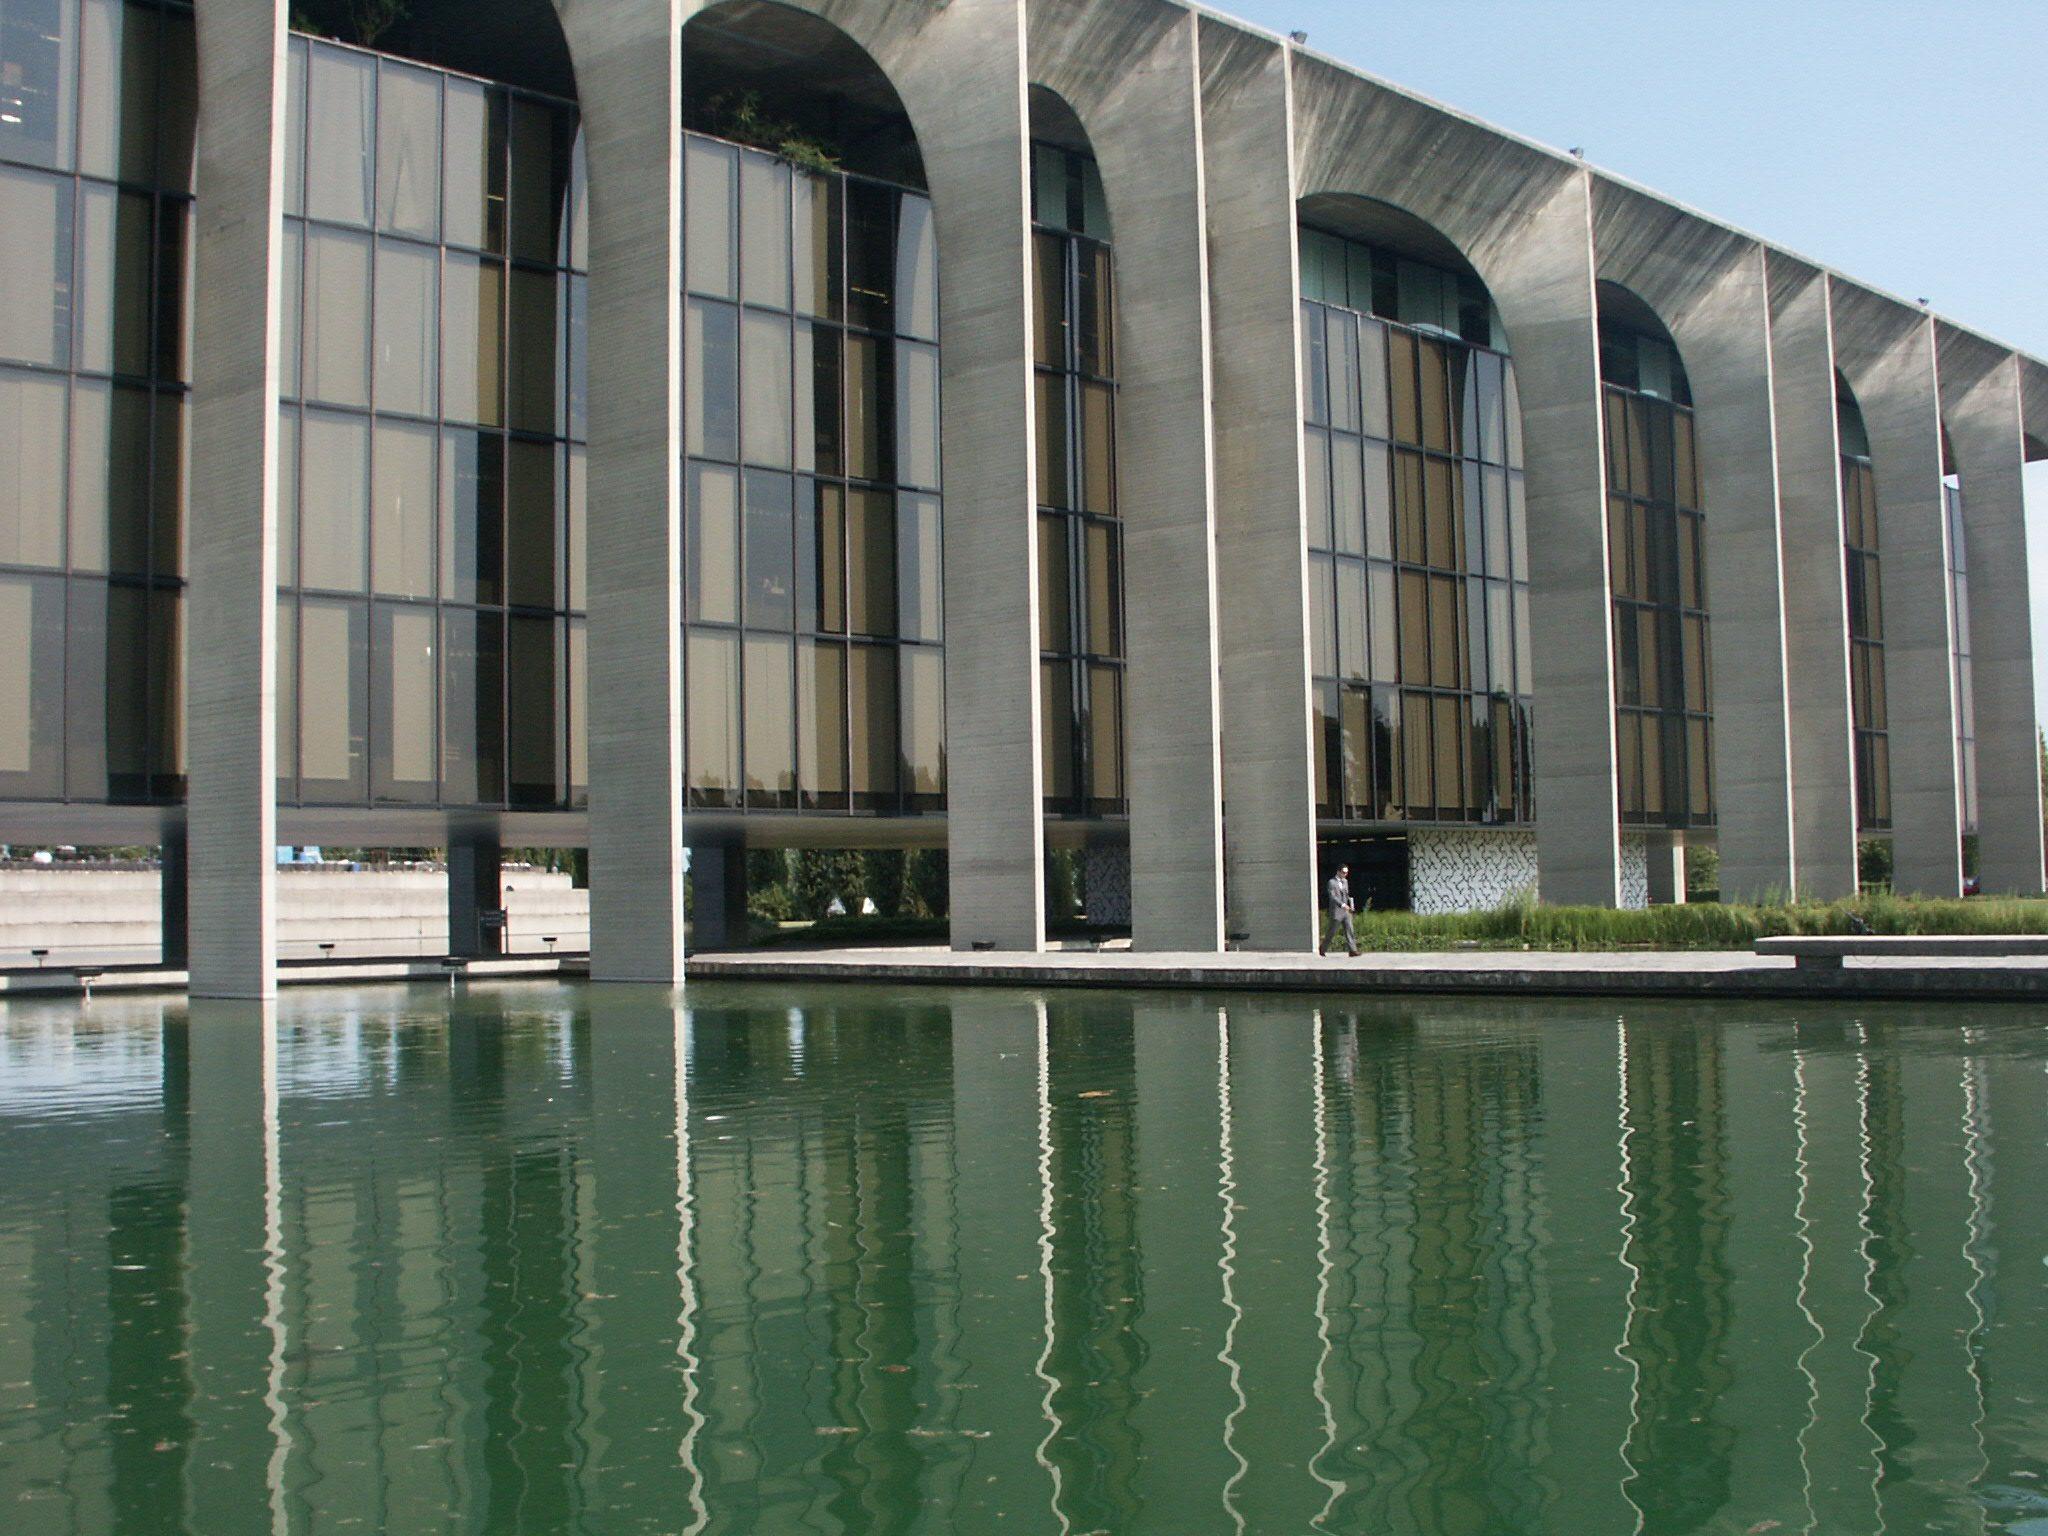 Oscar Niemeyer sede uffici Mondadori a Segrate Milano foto di Luca Bullaro